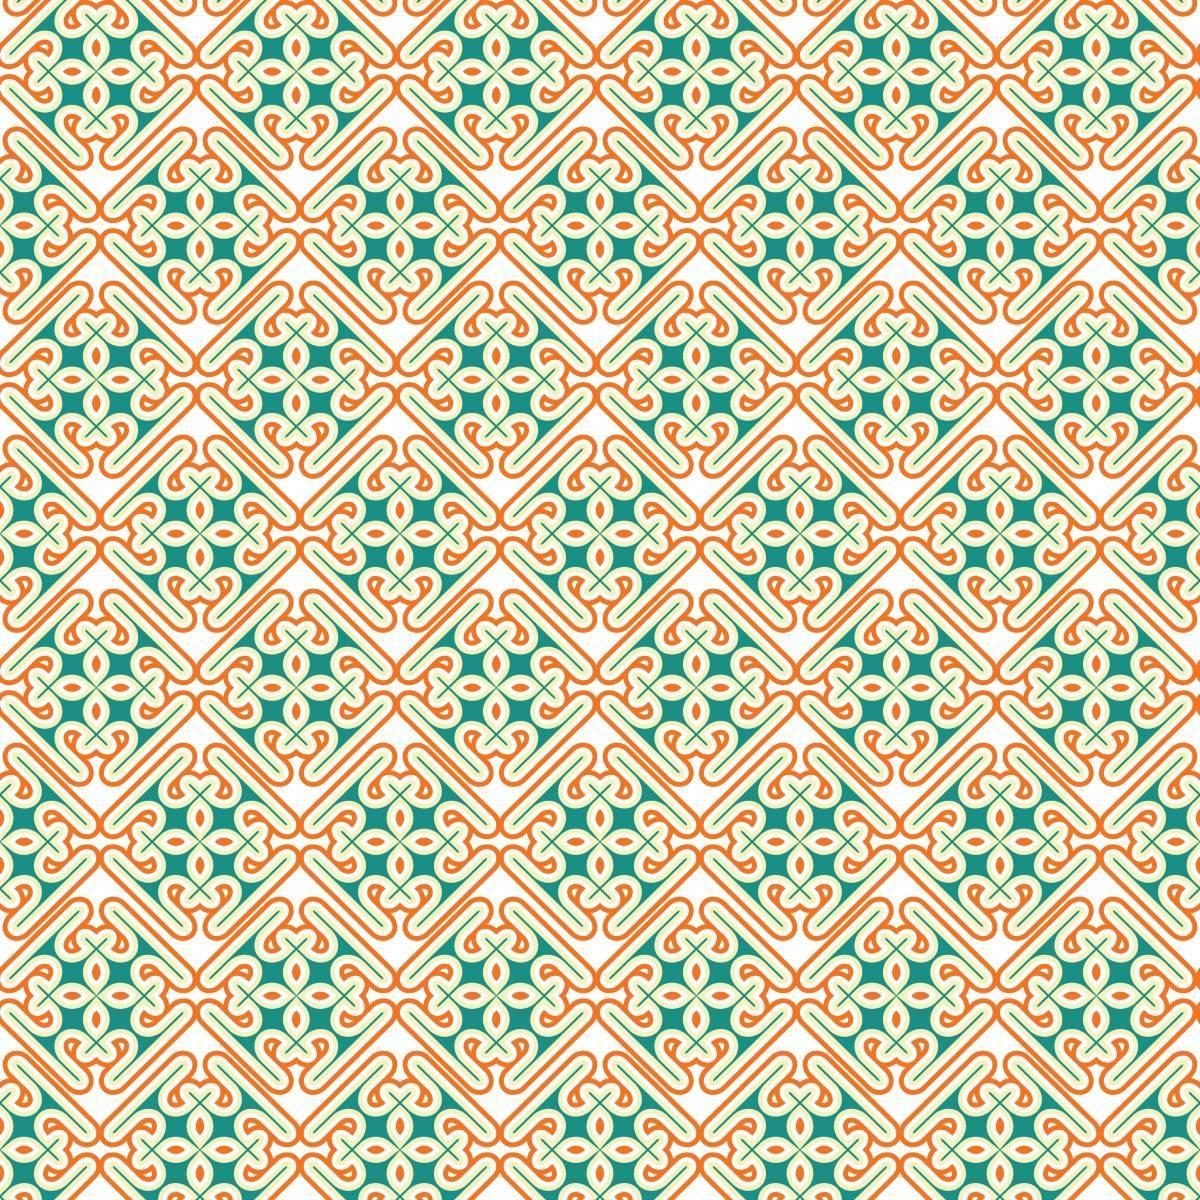 Papel de Parede Retrô Colorido | Adesivo Vinilico imagem 2